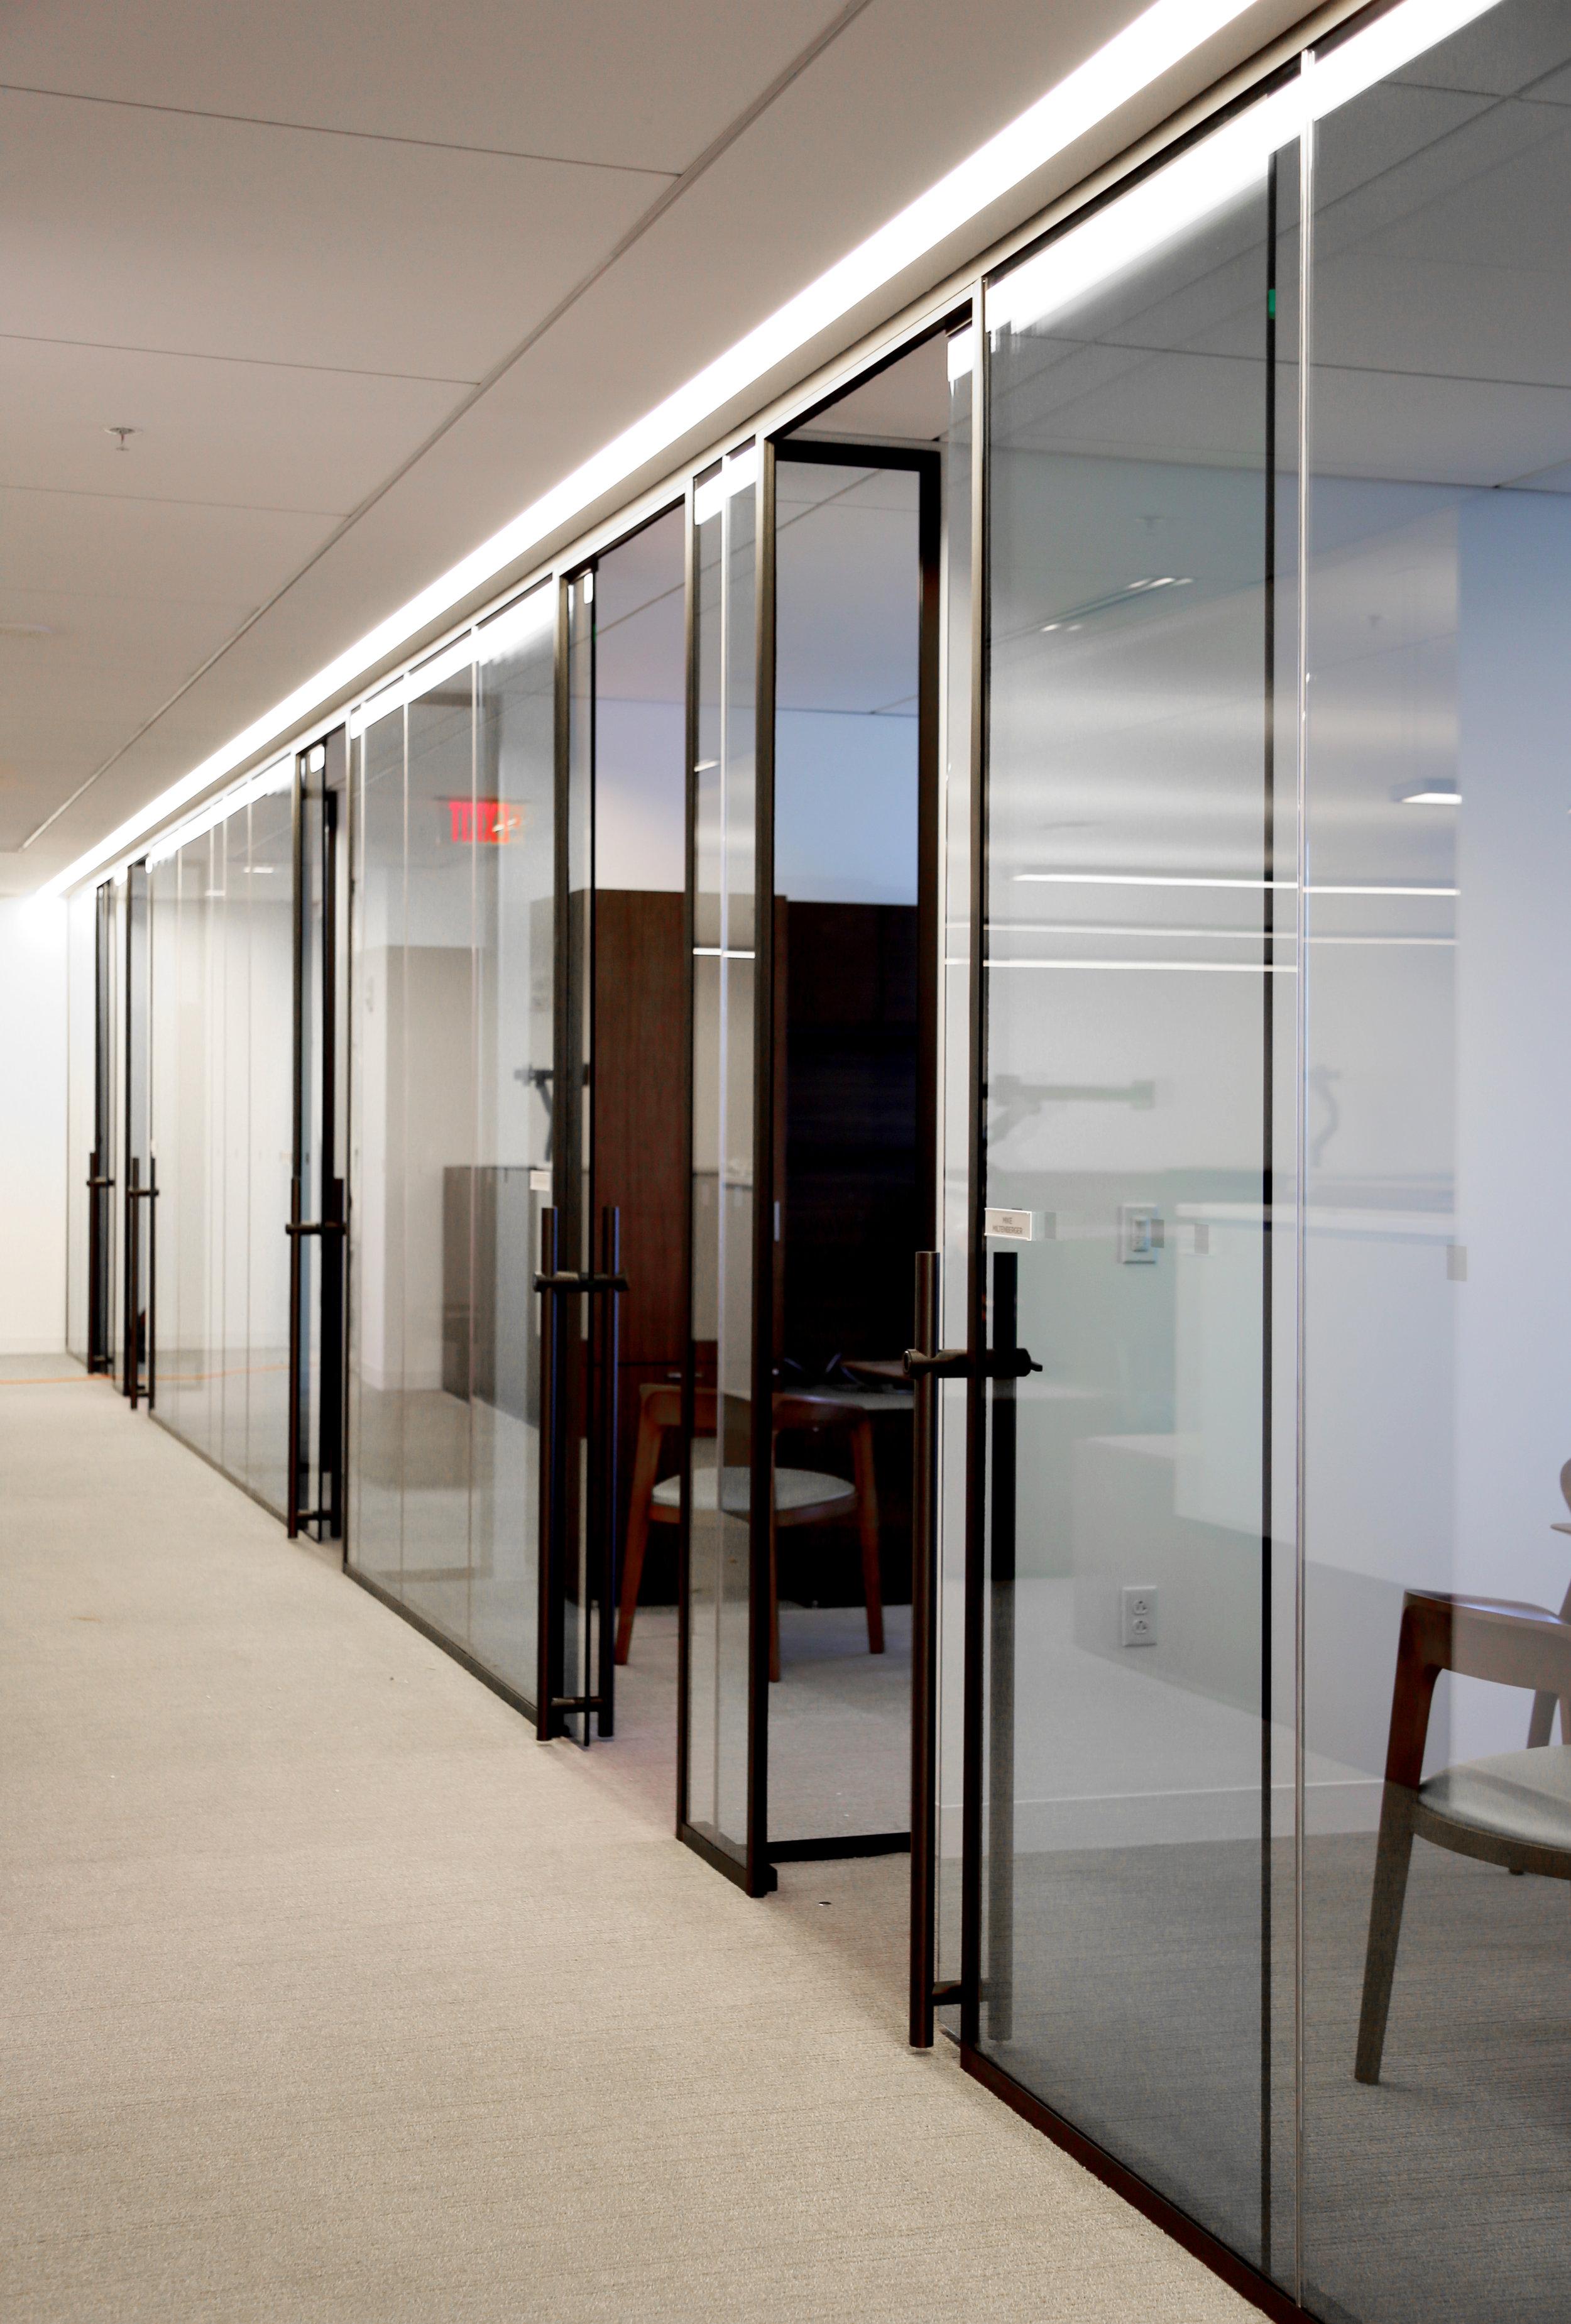 Modernus Demountable Glass Office Wall System - Spaceworks AI.jpg